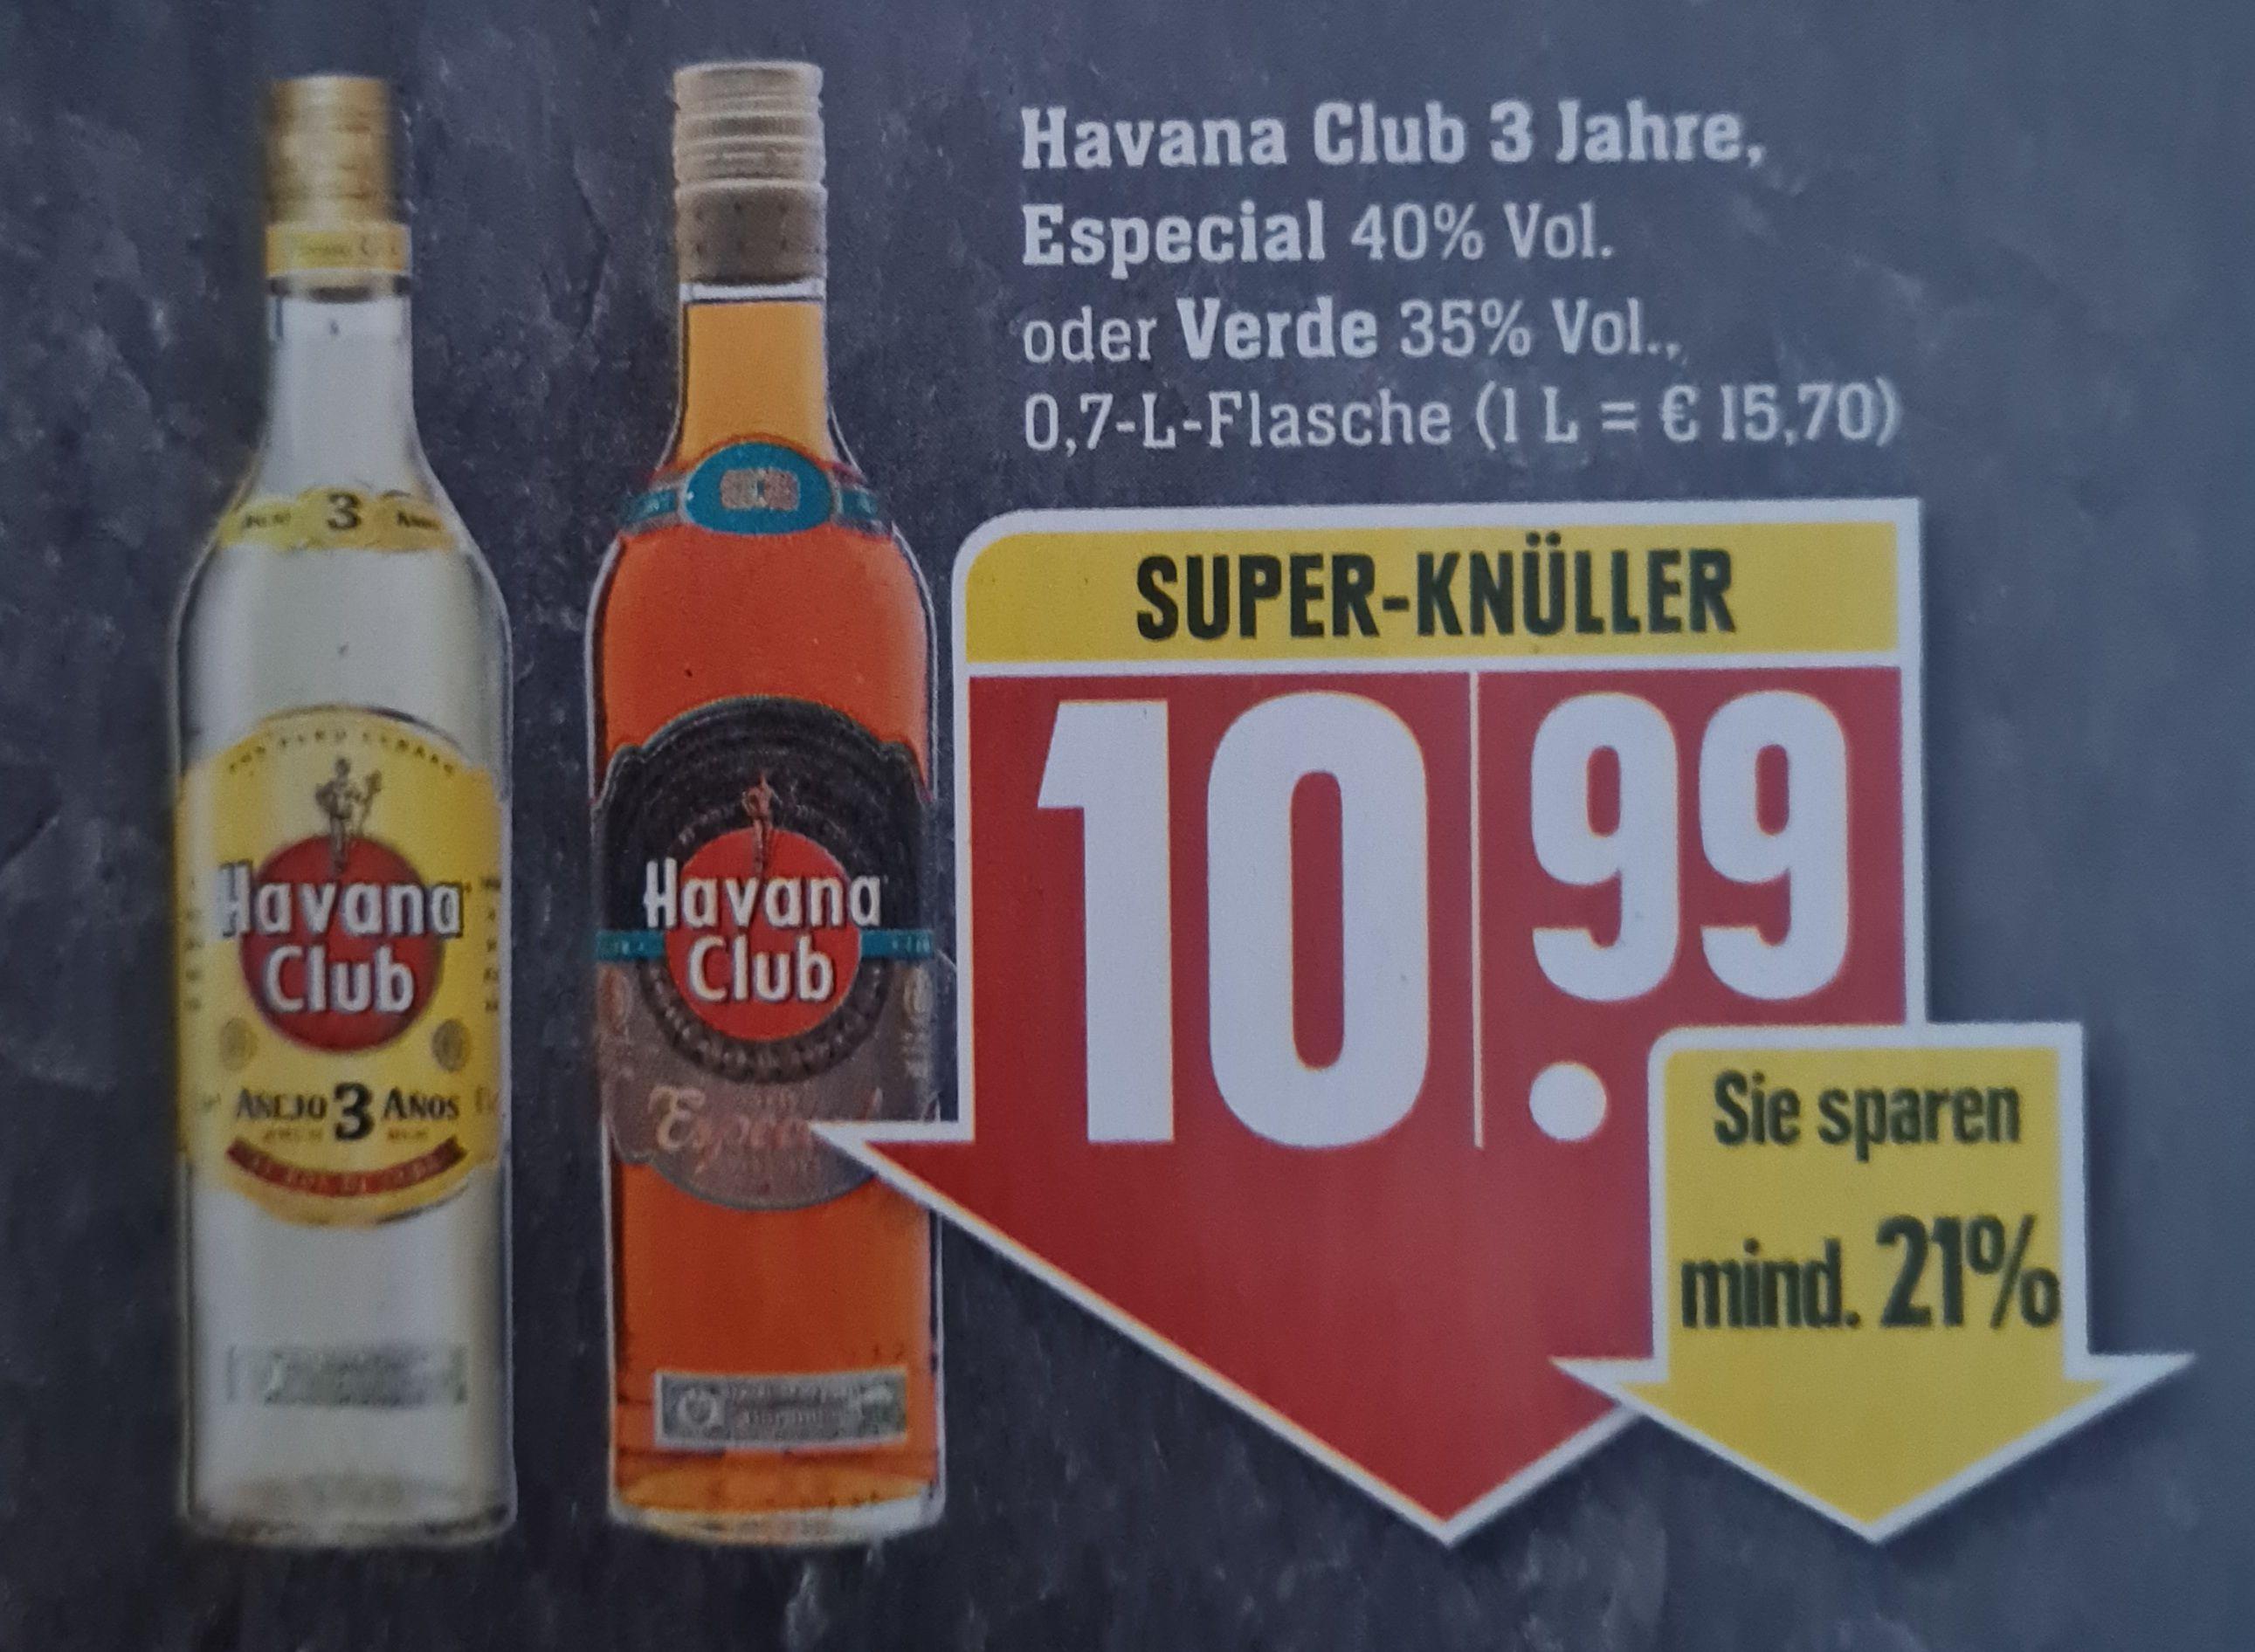 Havana Club 3 Jahre, Especial 40% oder Verde 35% Vol. 0,7 l ab 10.05 Edeka Südwest